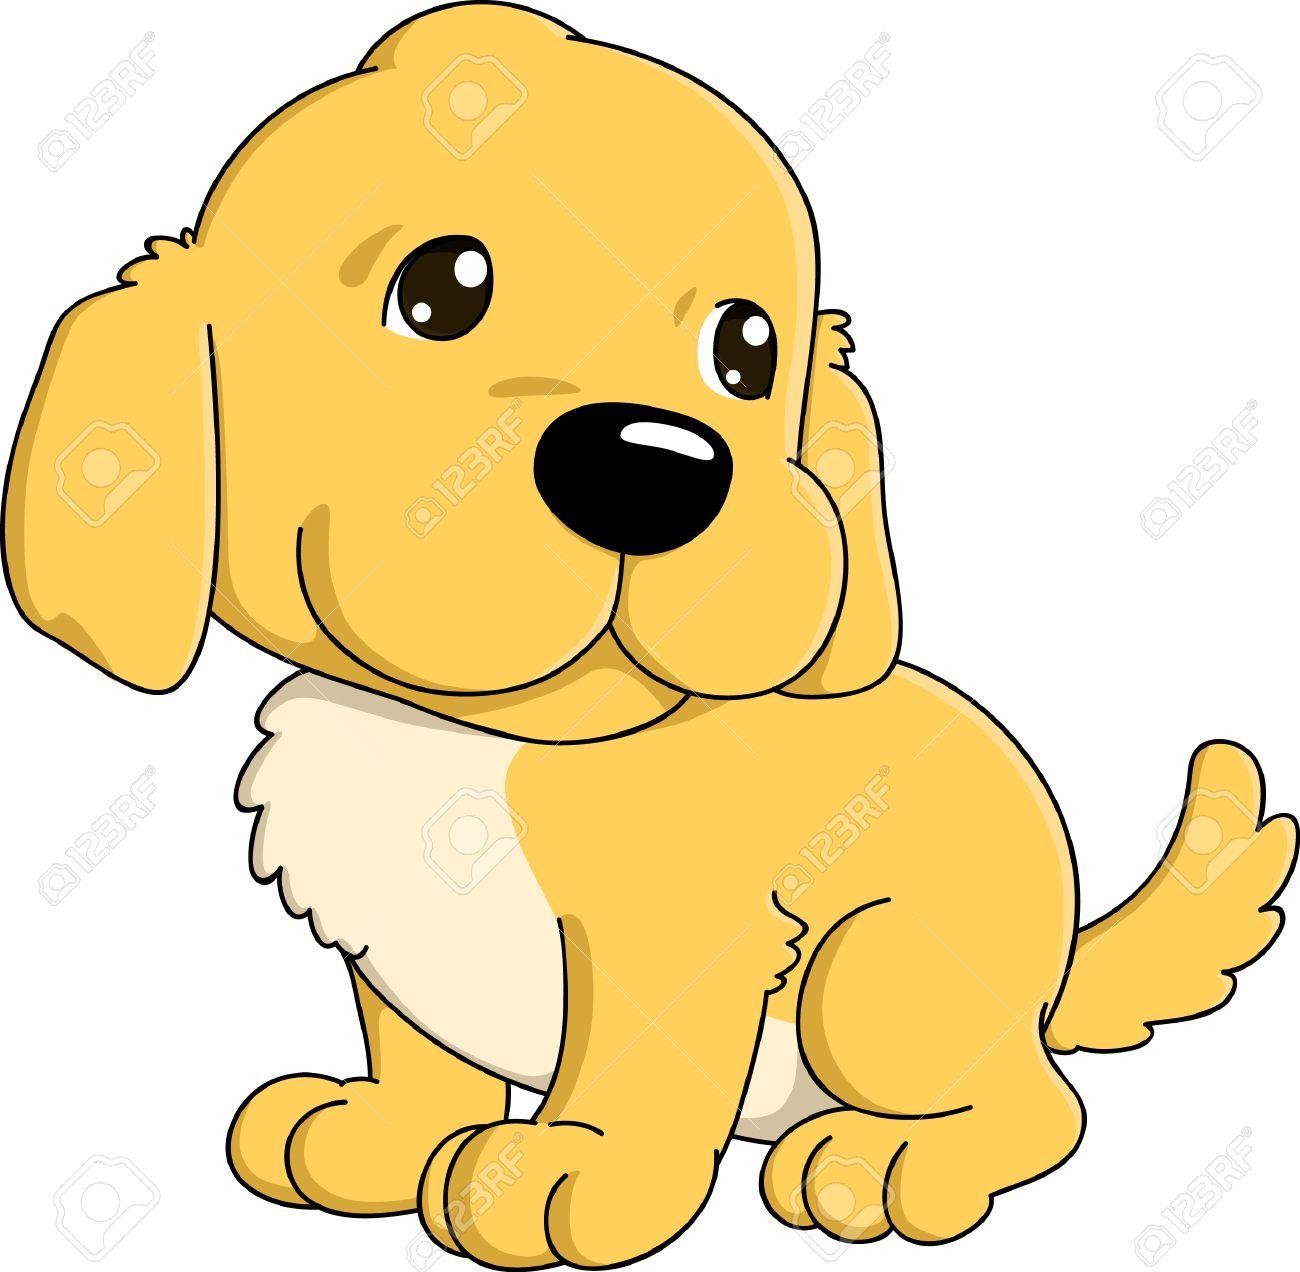 Cute Cartoon Of Golden Retriever Puppy Royalty Free Cliparts